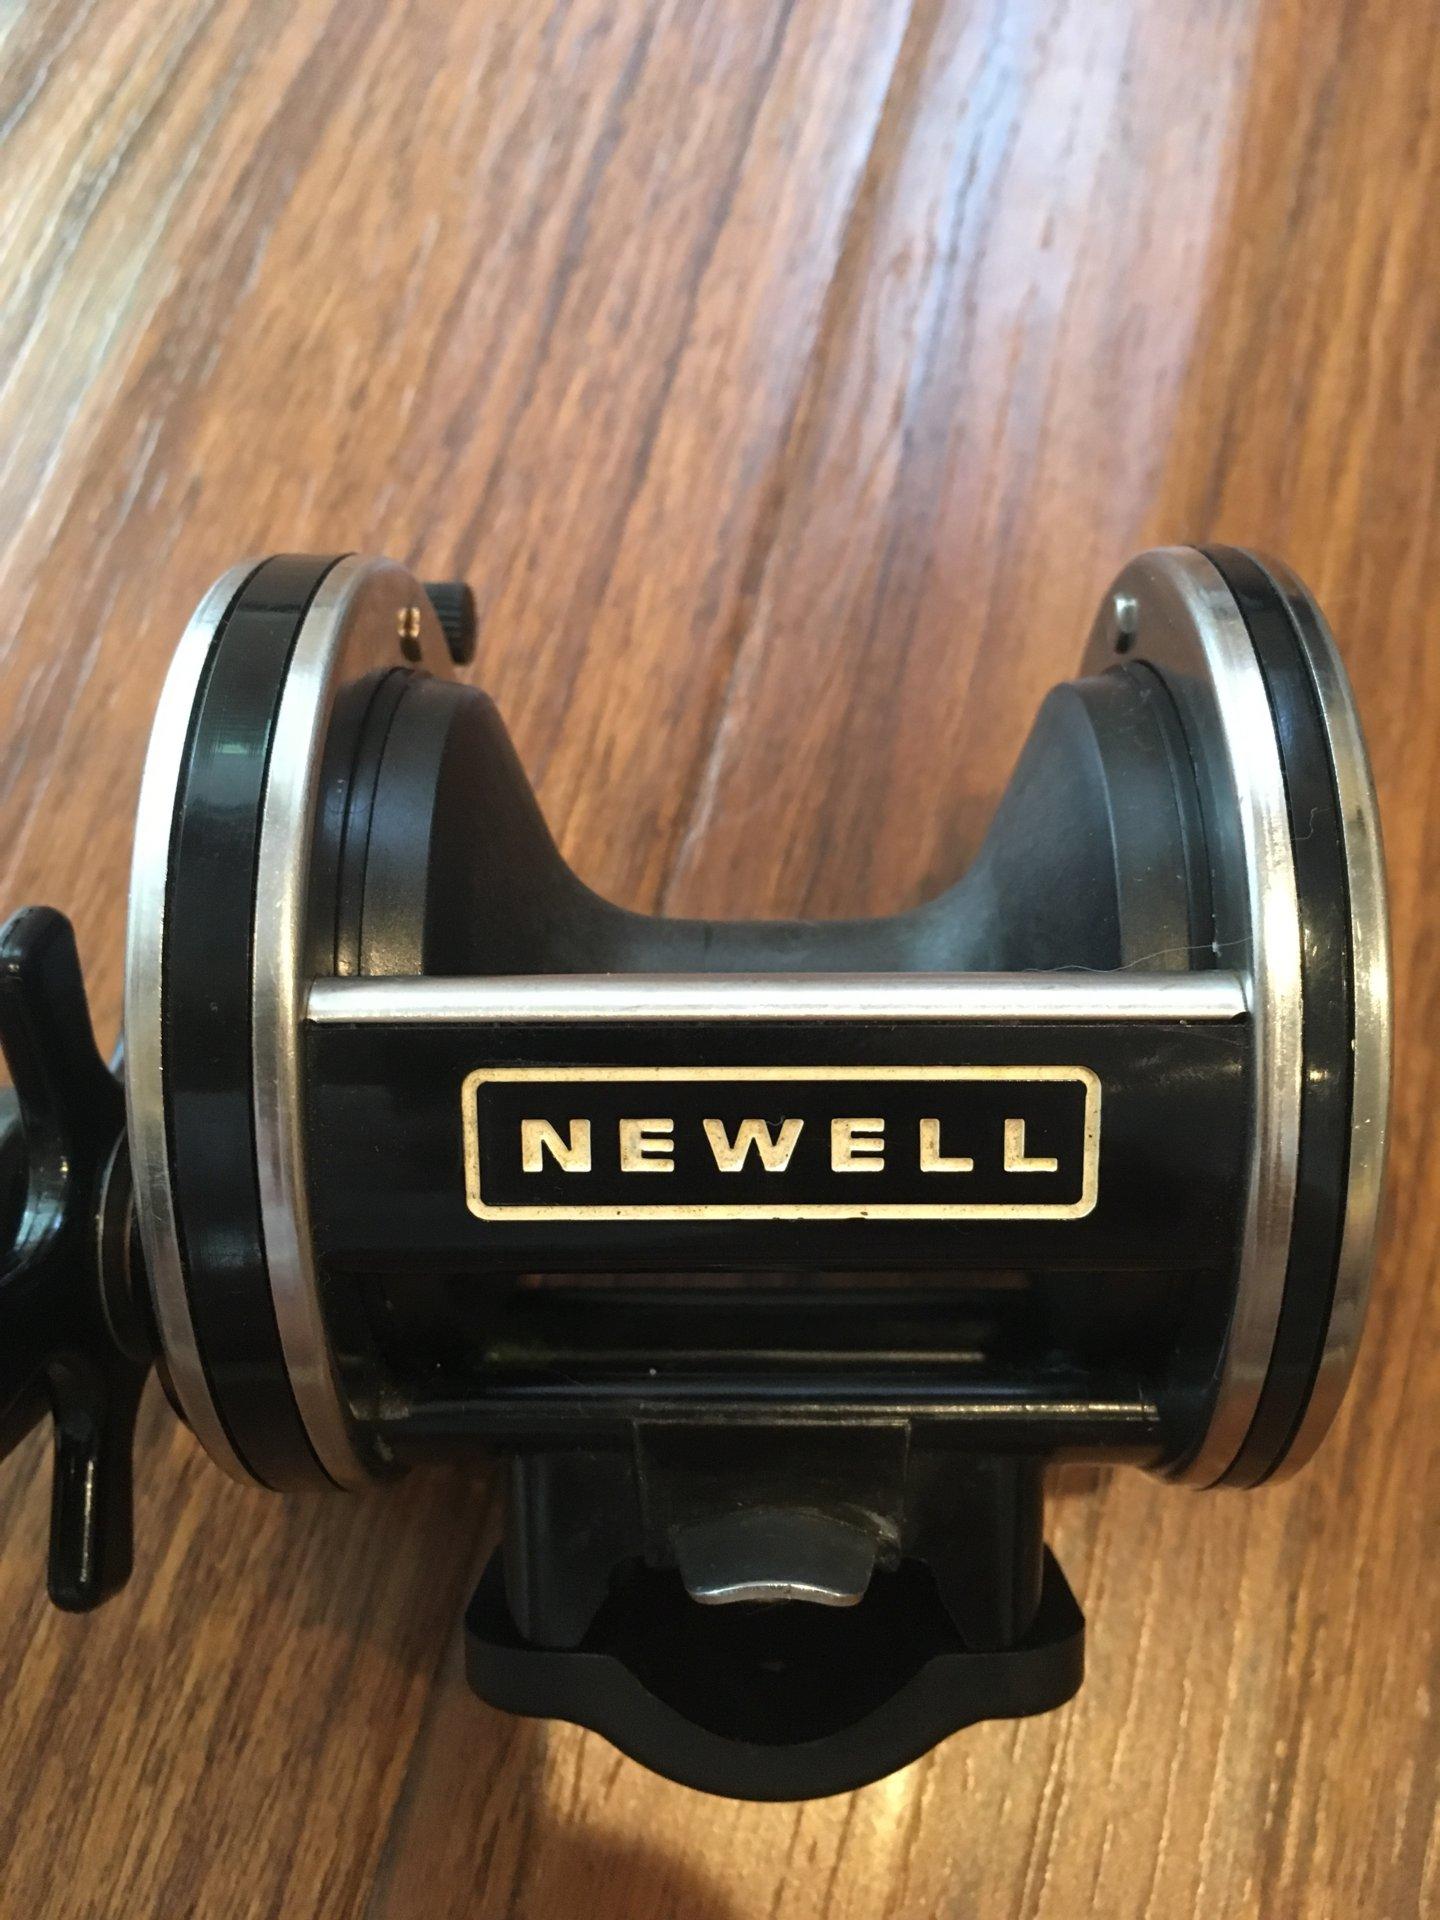 Newell-003.JPG